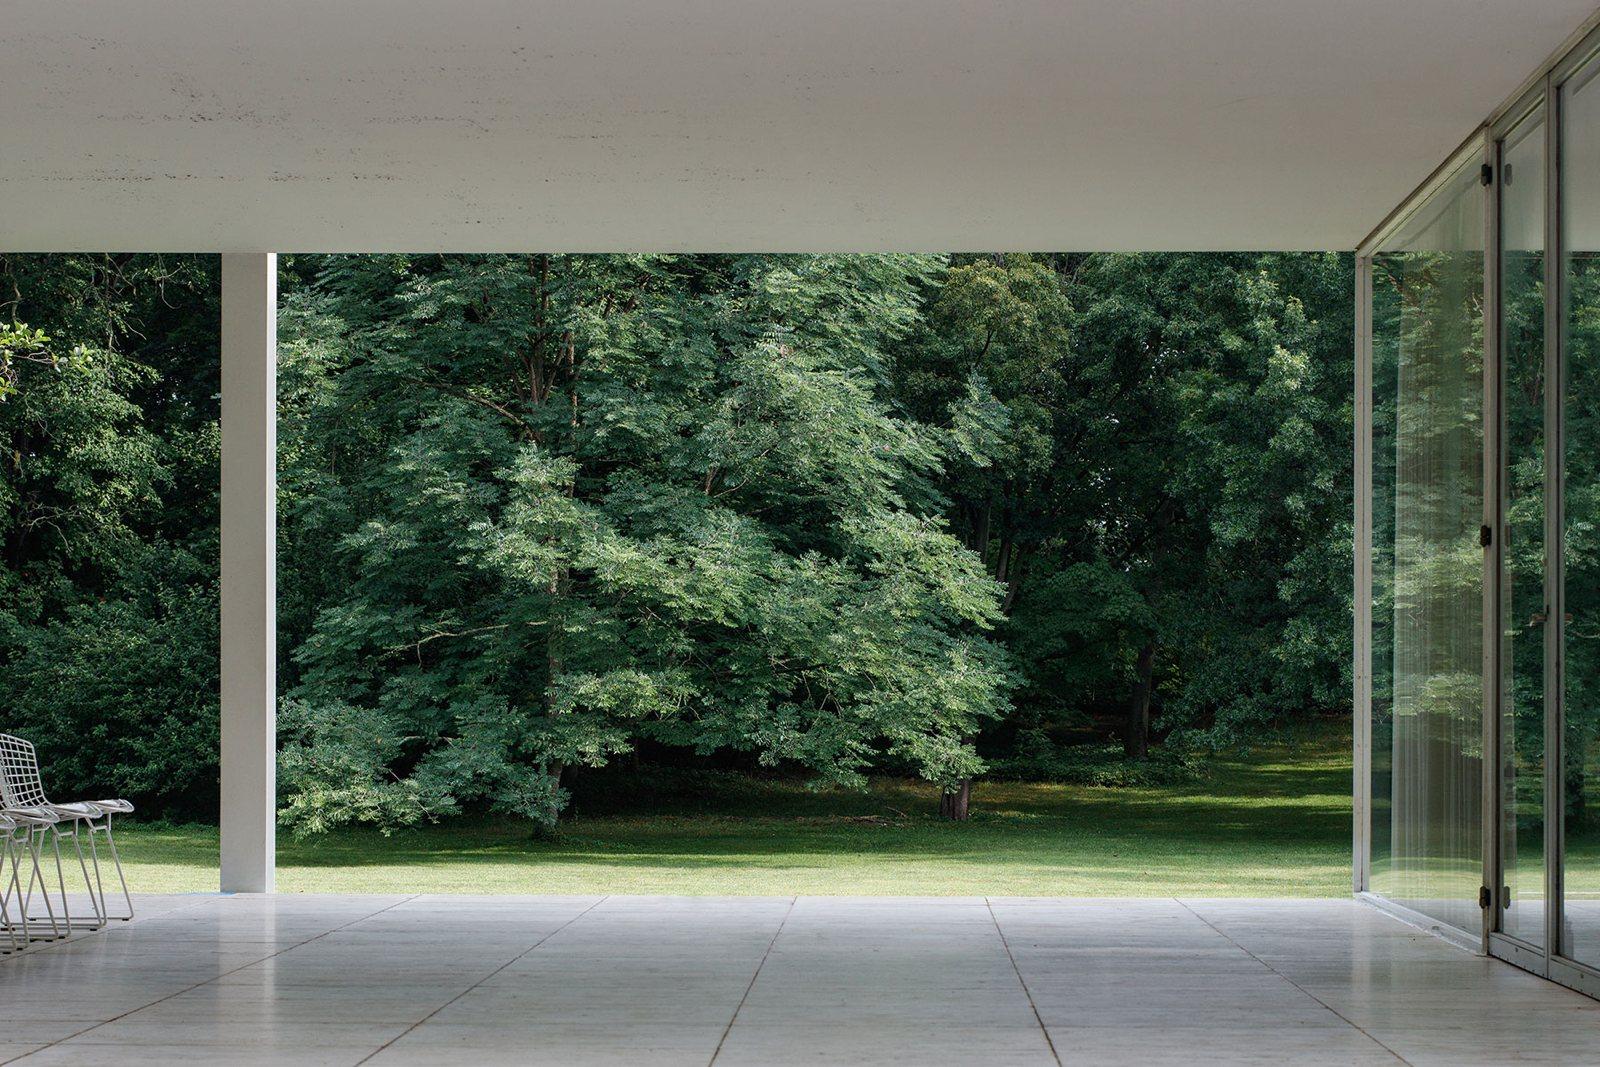 Farnsworth House Design